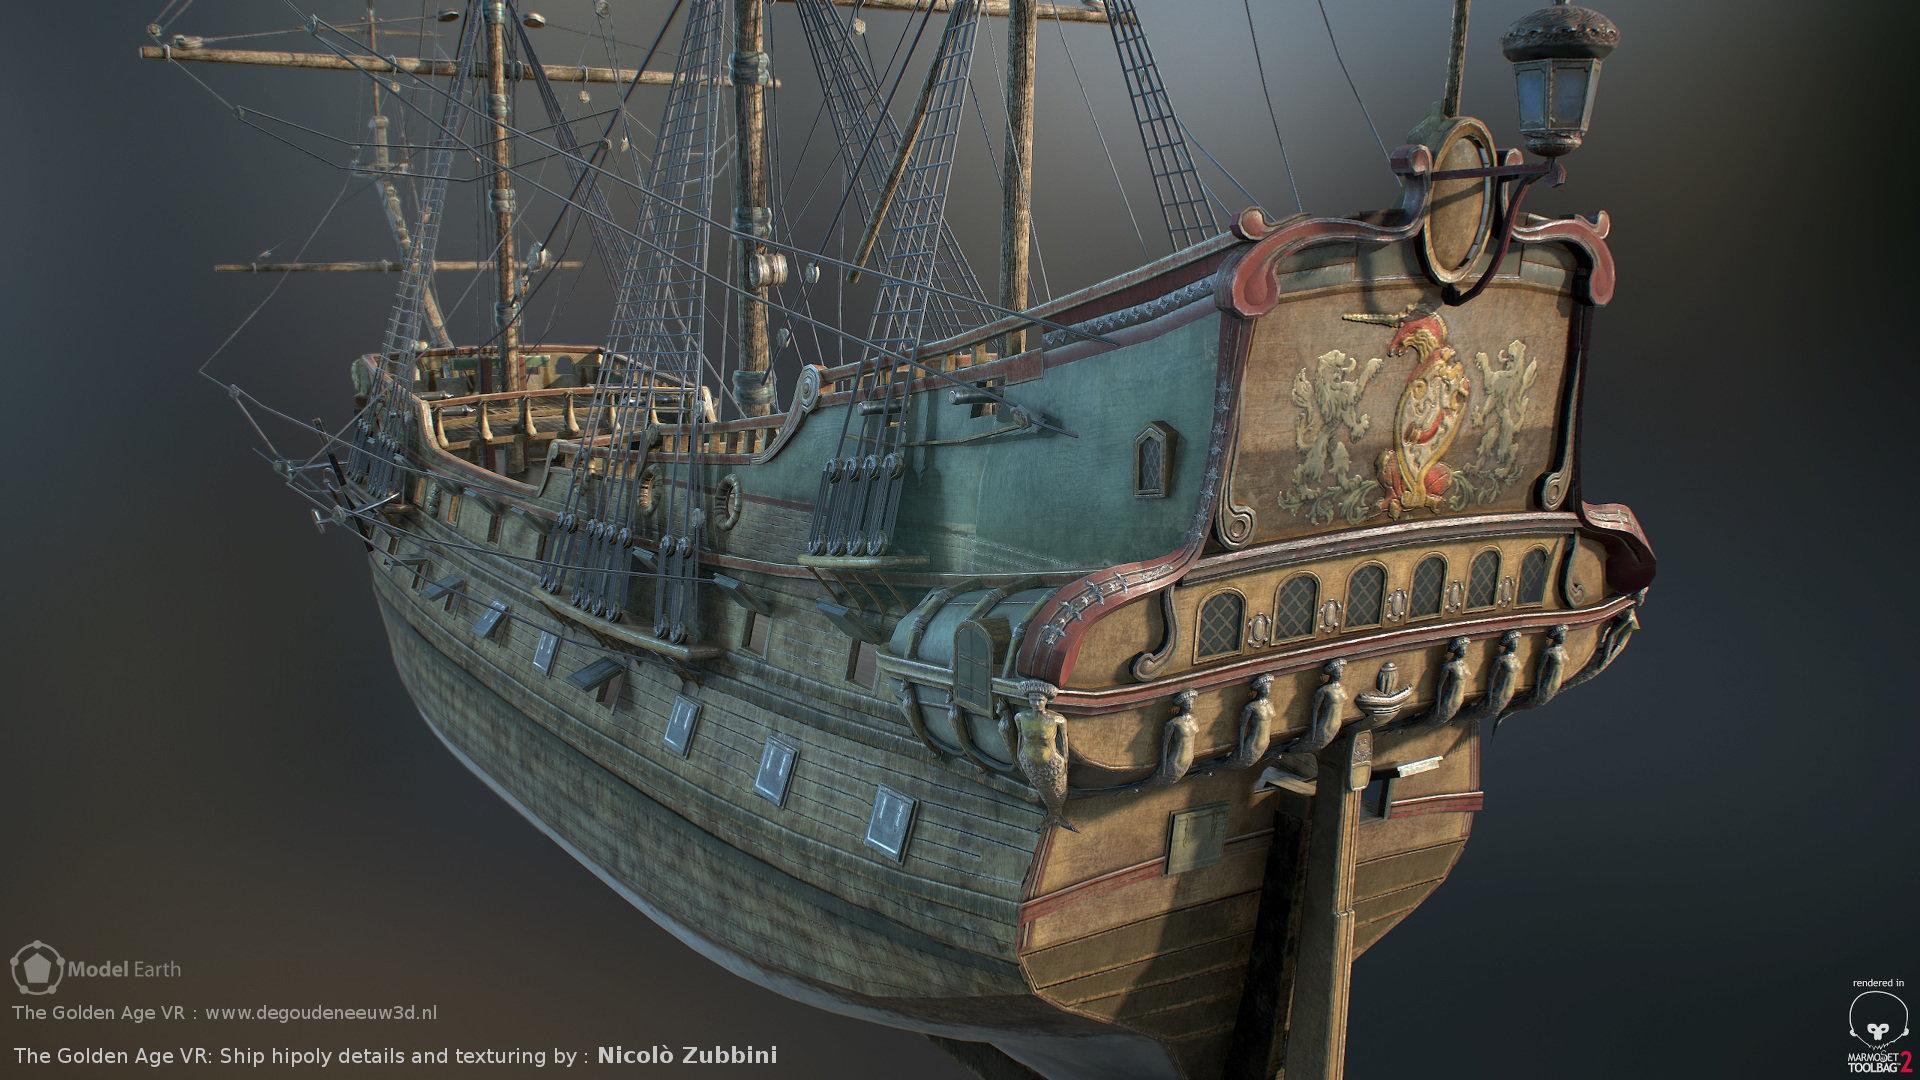 Nicolo zubbini gavr ship render2